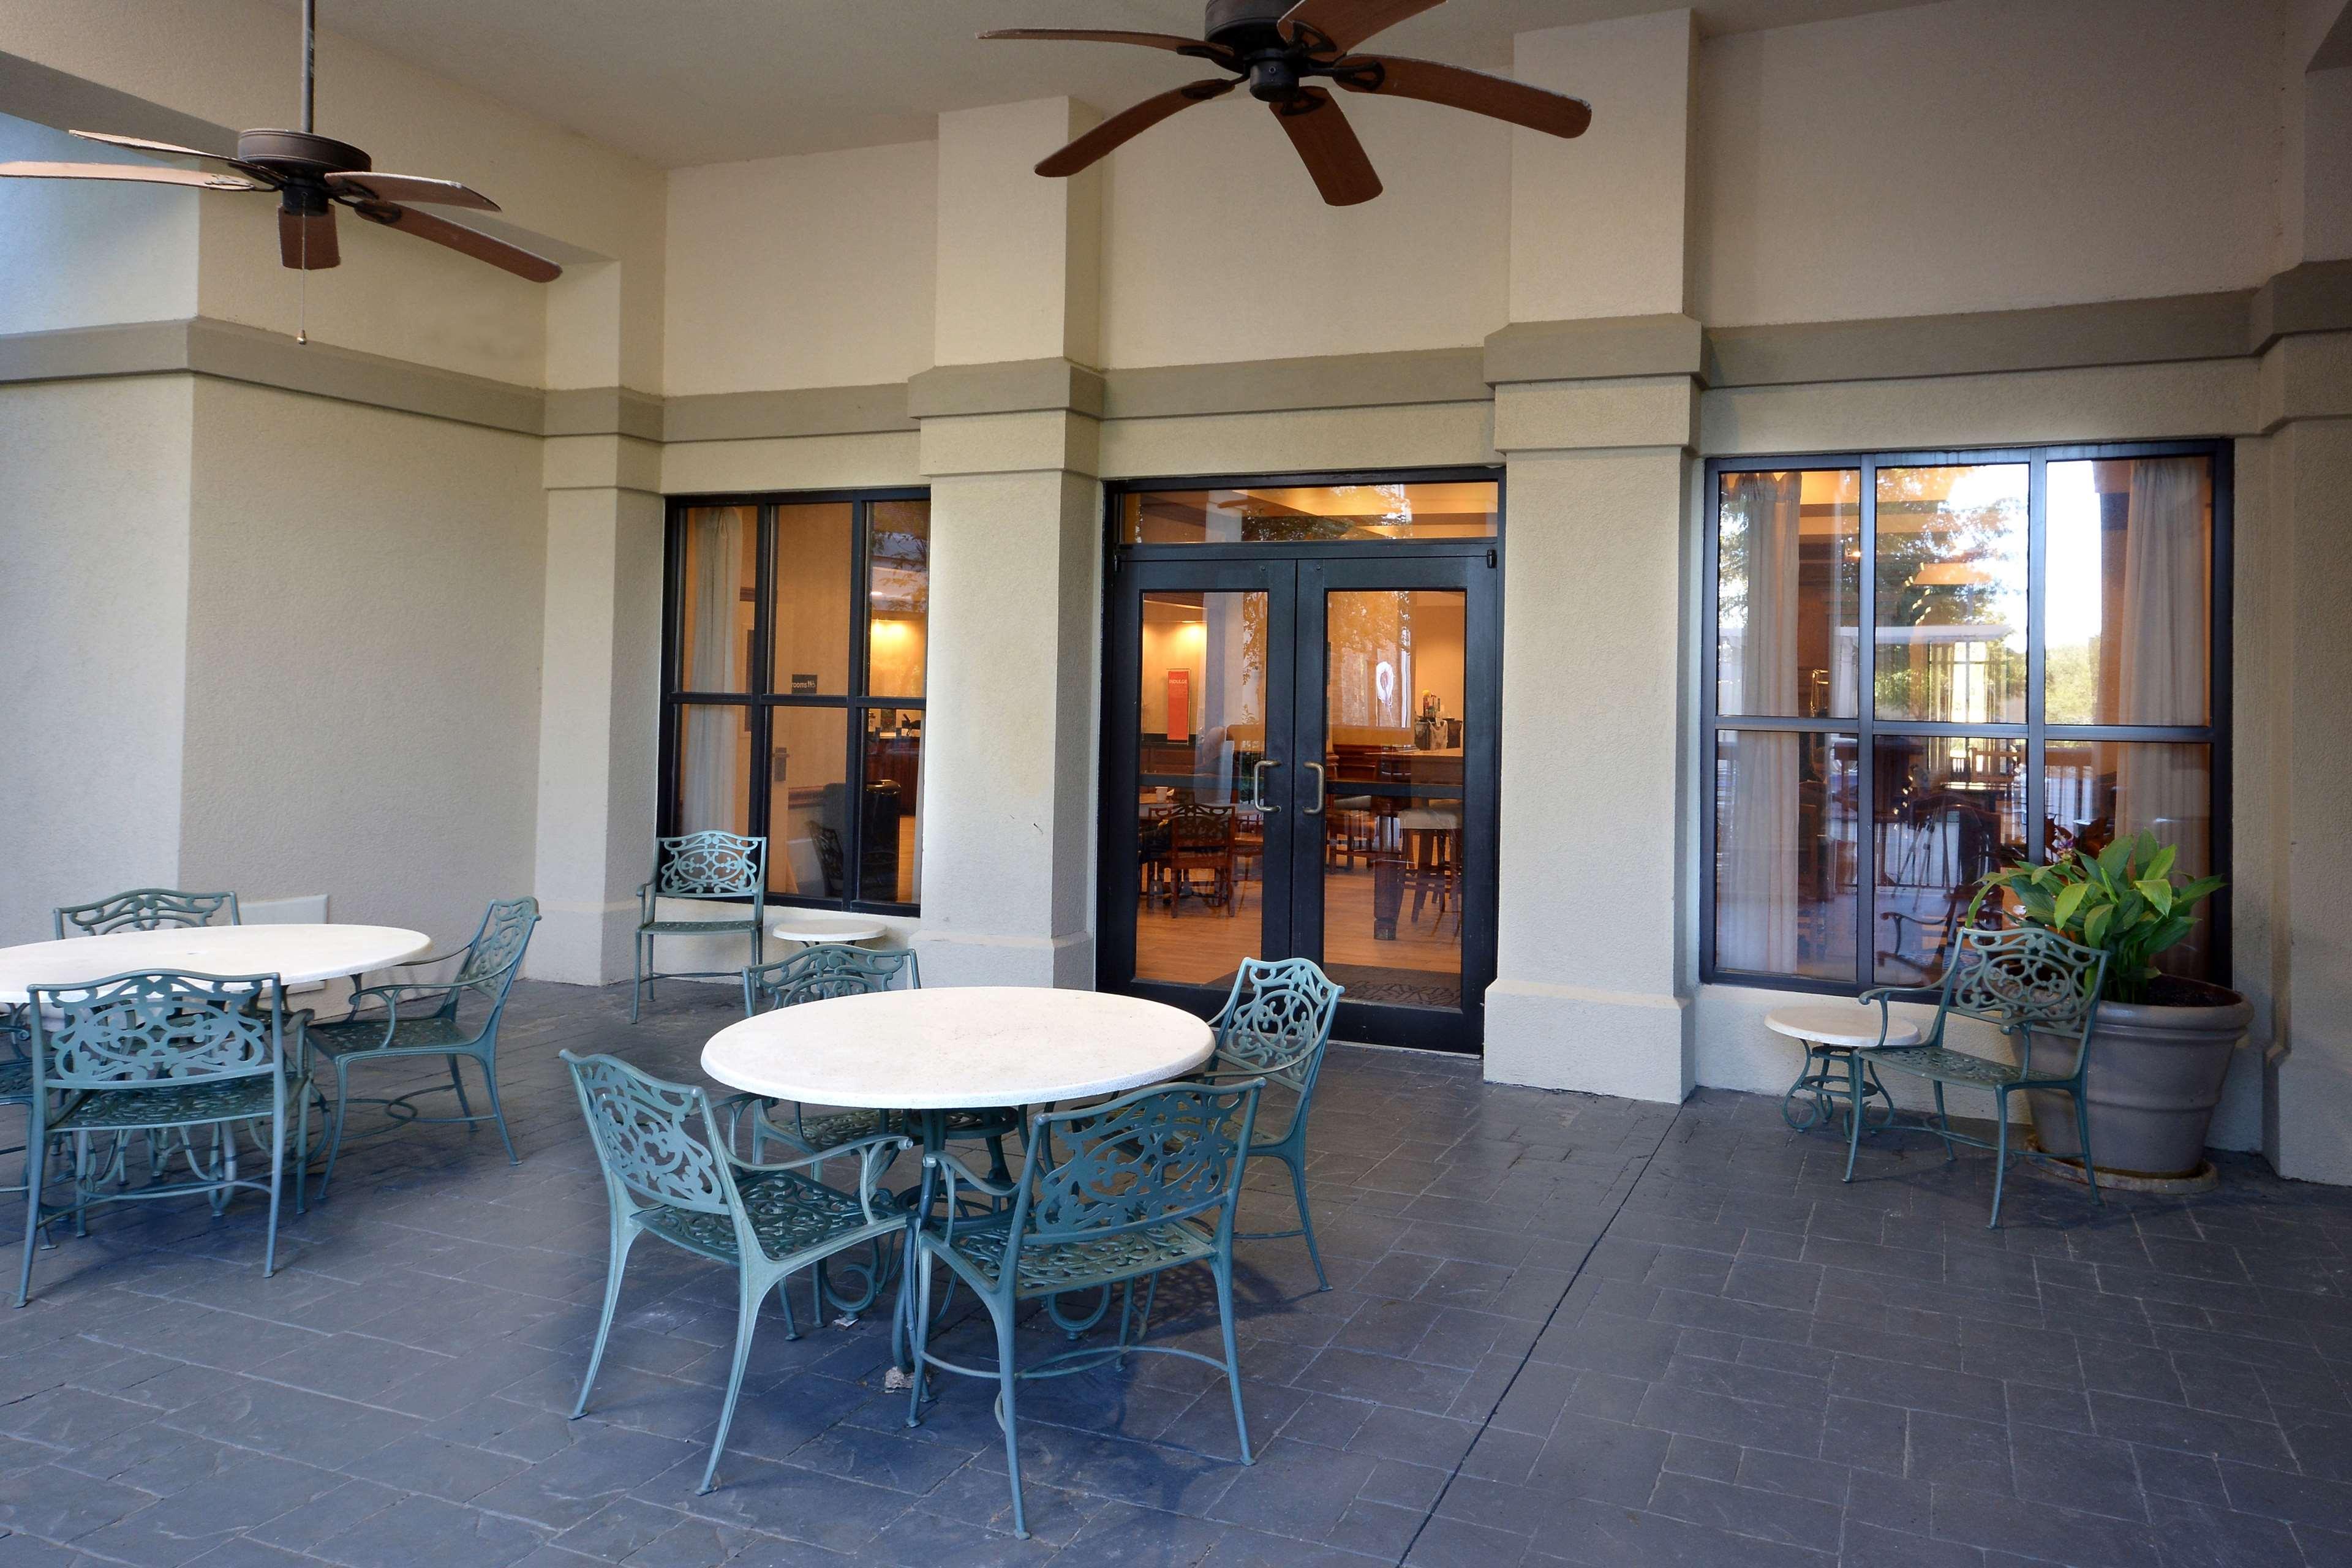 Hampton Inn & Suites Greenville/Spartanburg I-85 image 7